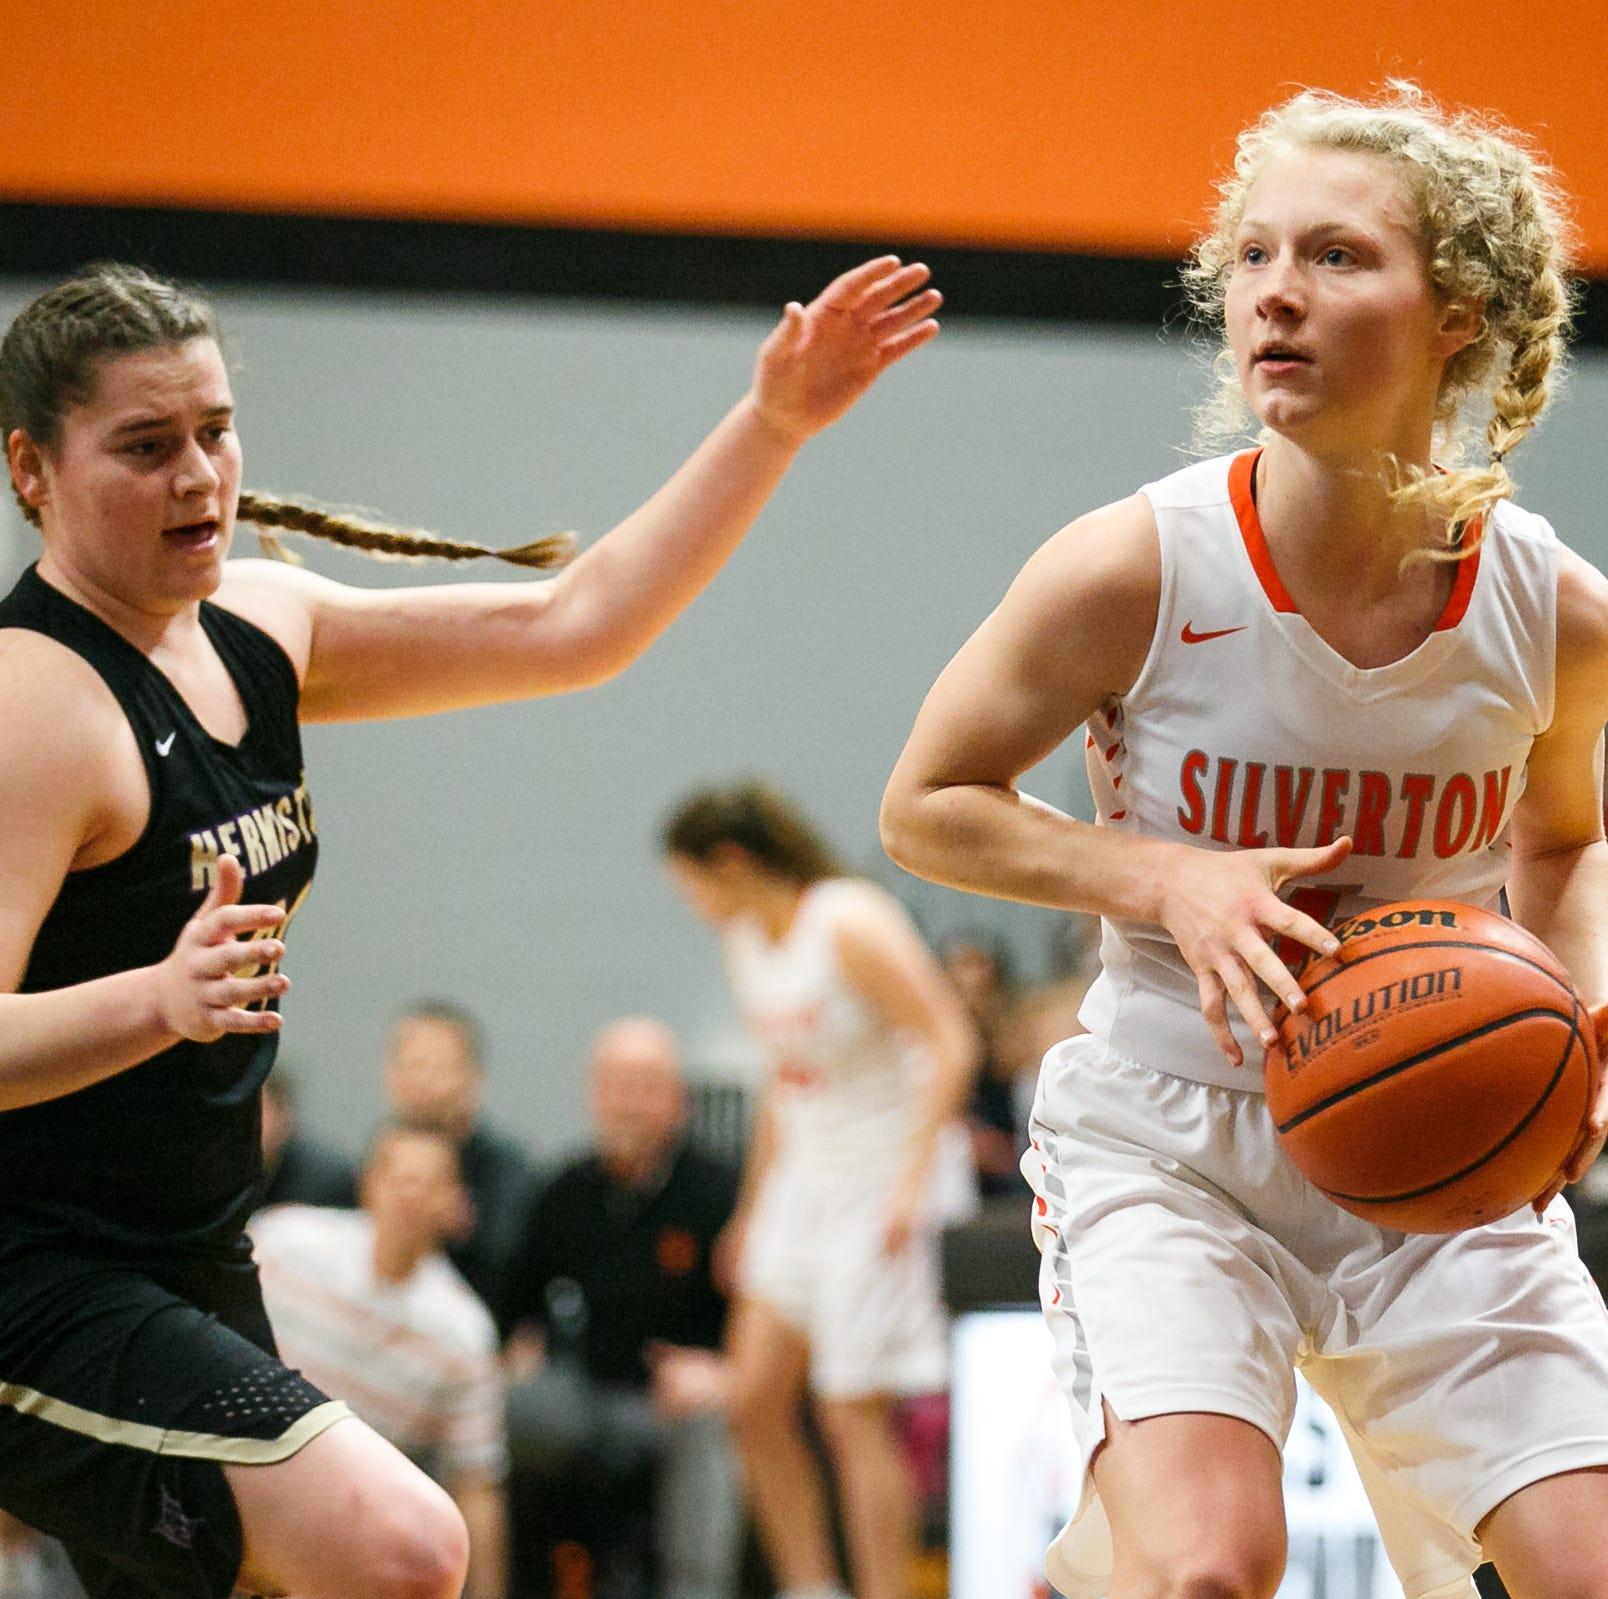 Silverton's Schmitz voted SJ Athlete of the Week